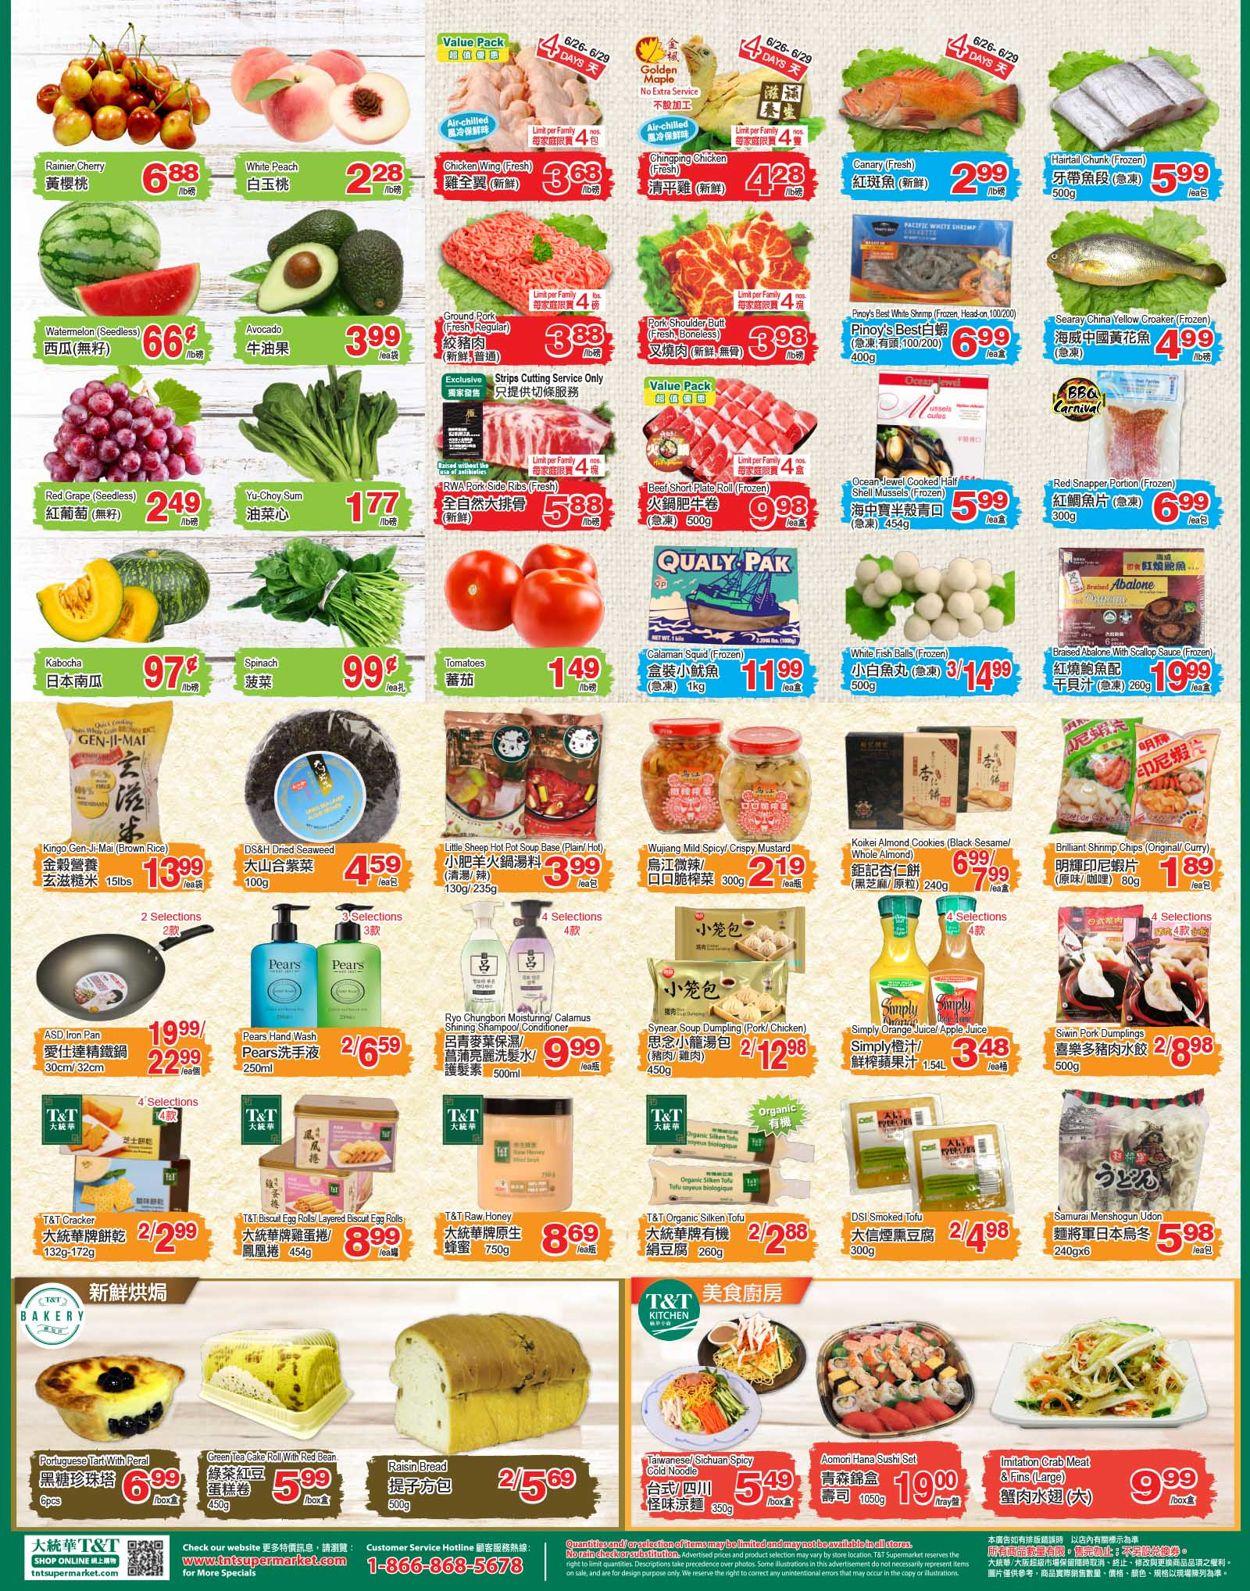 T&T Supermarket Flyer - 06/26-07/02/2020 (Page 2)